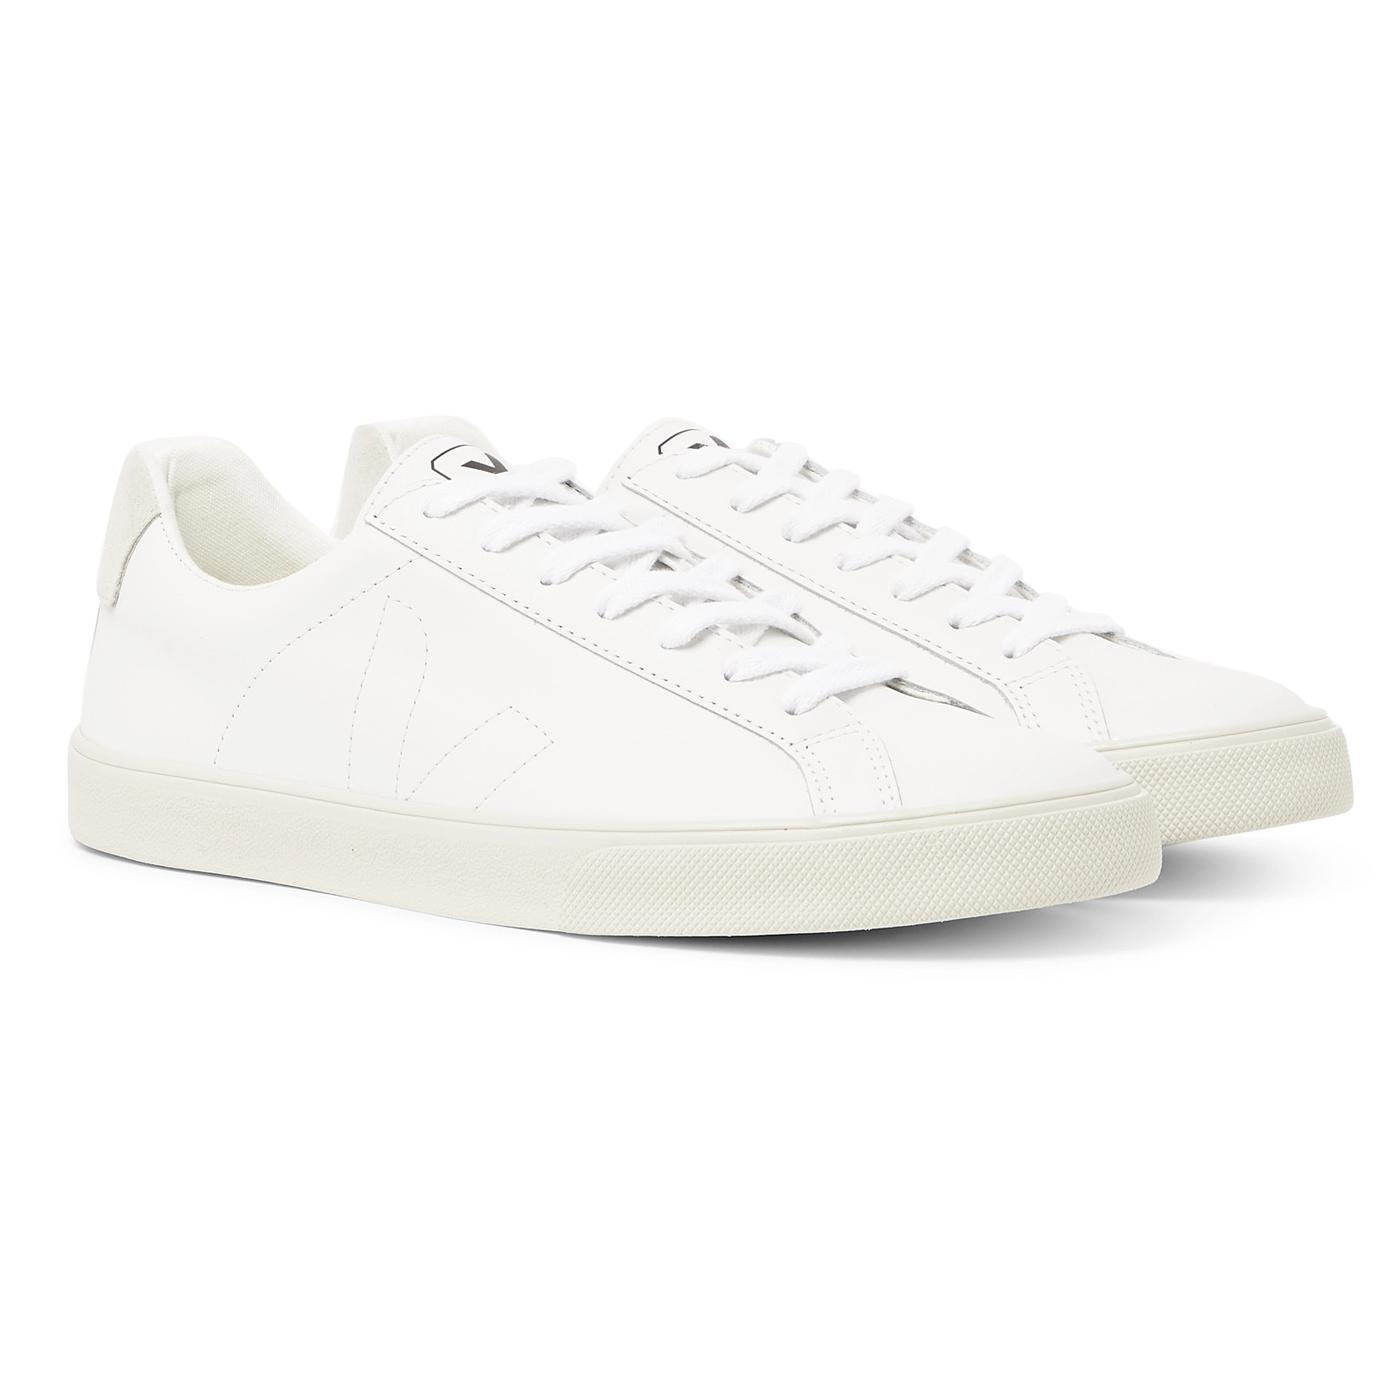 Style Mr Porter Sneakers Veja Cuir Blanc